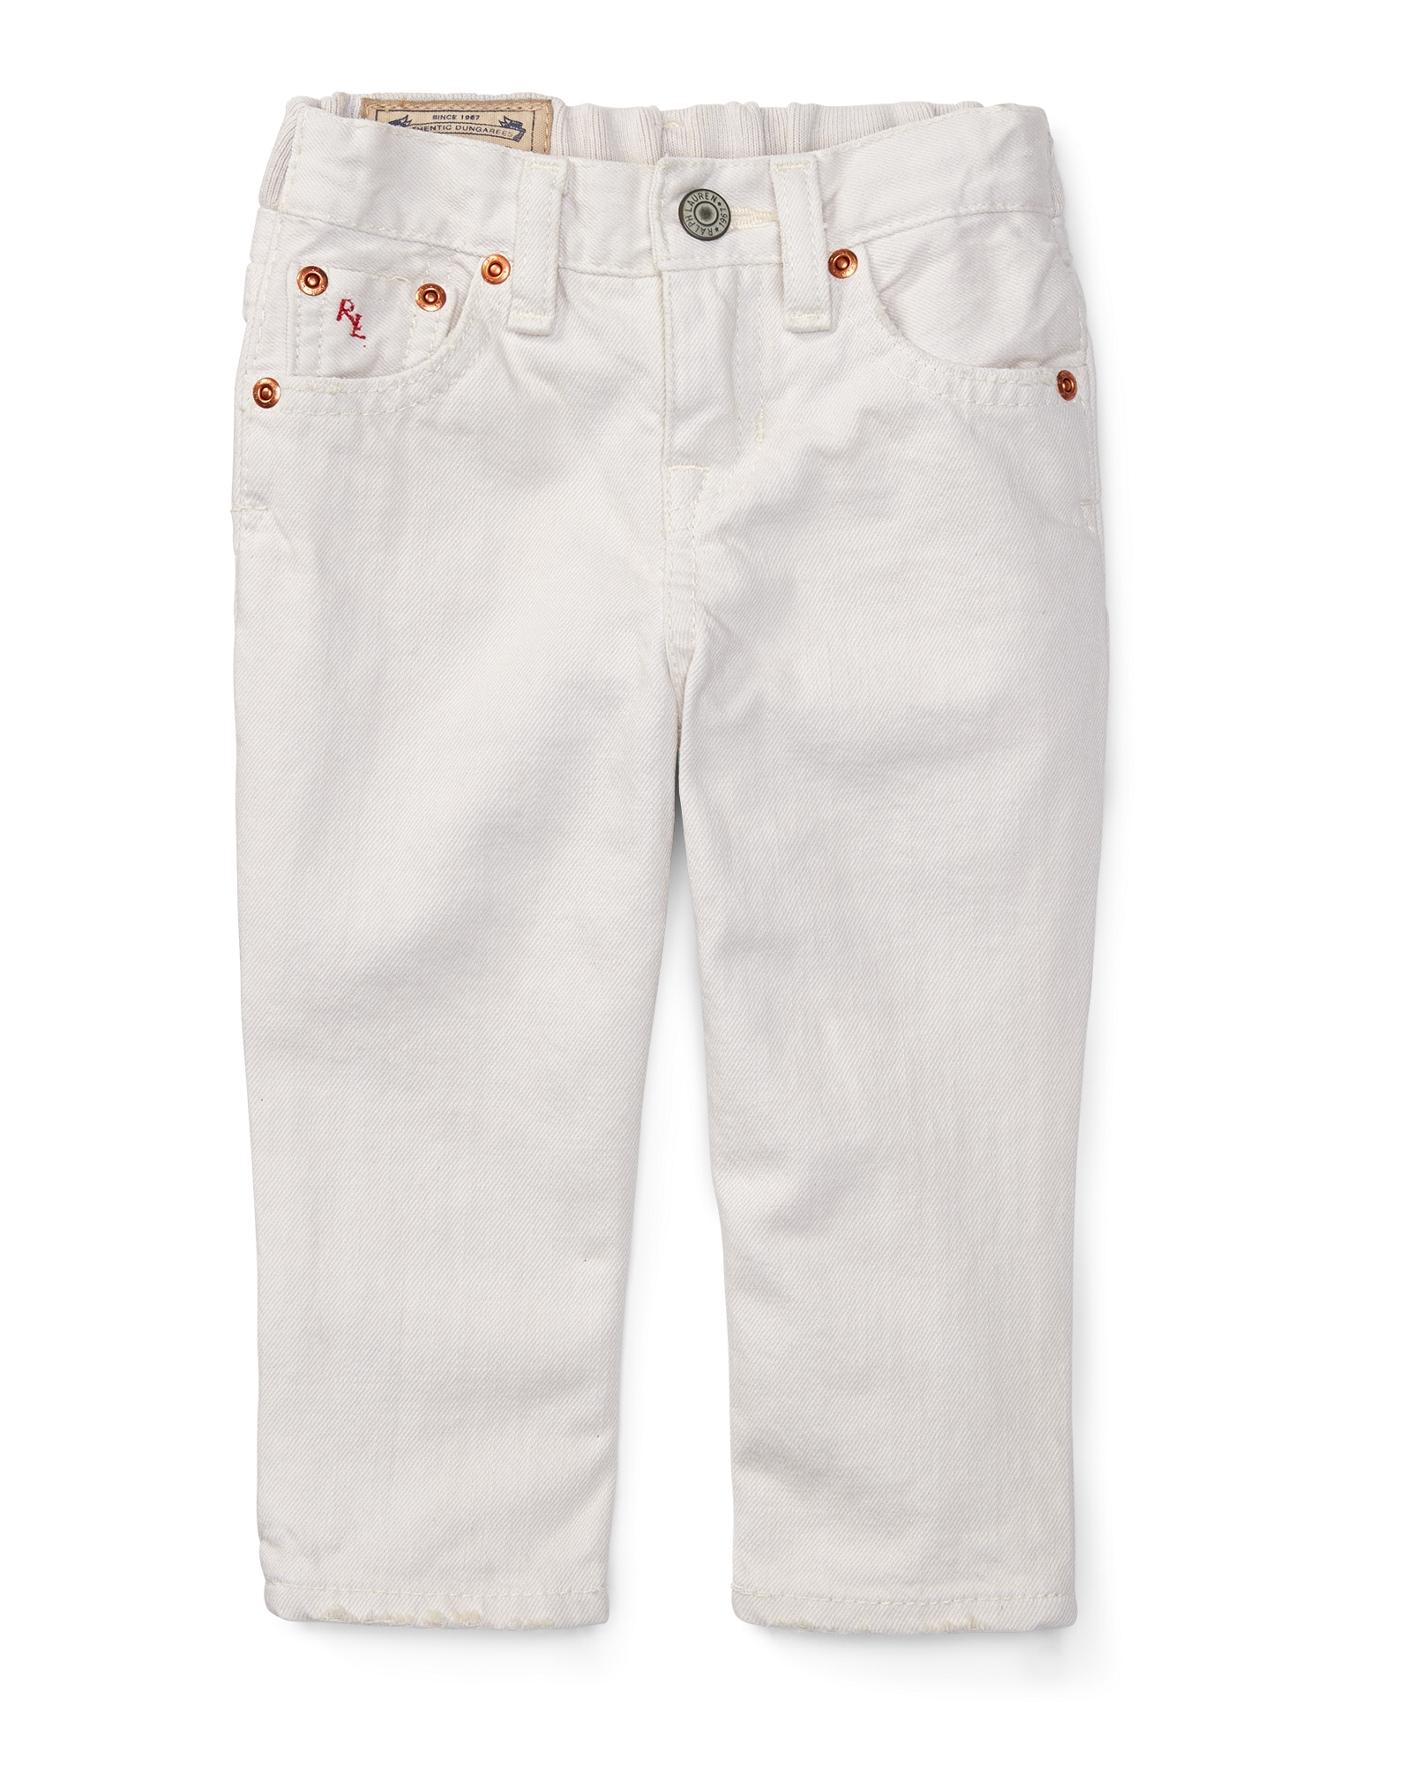 Baby Boy Bottoms - Pants, Leggings, Shorts | Ralph Lauren.com